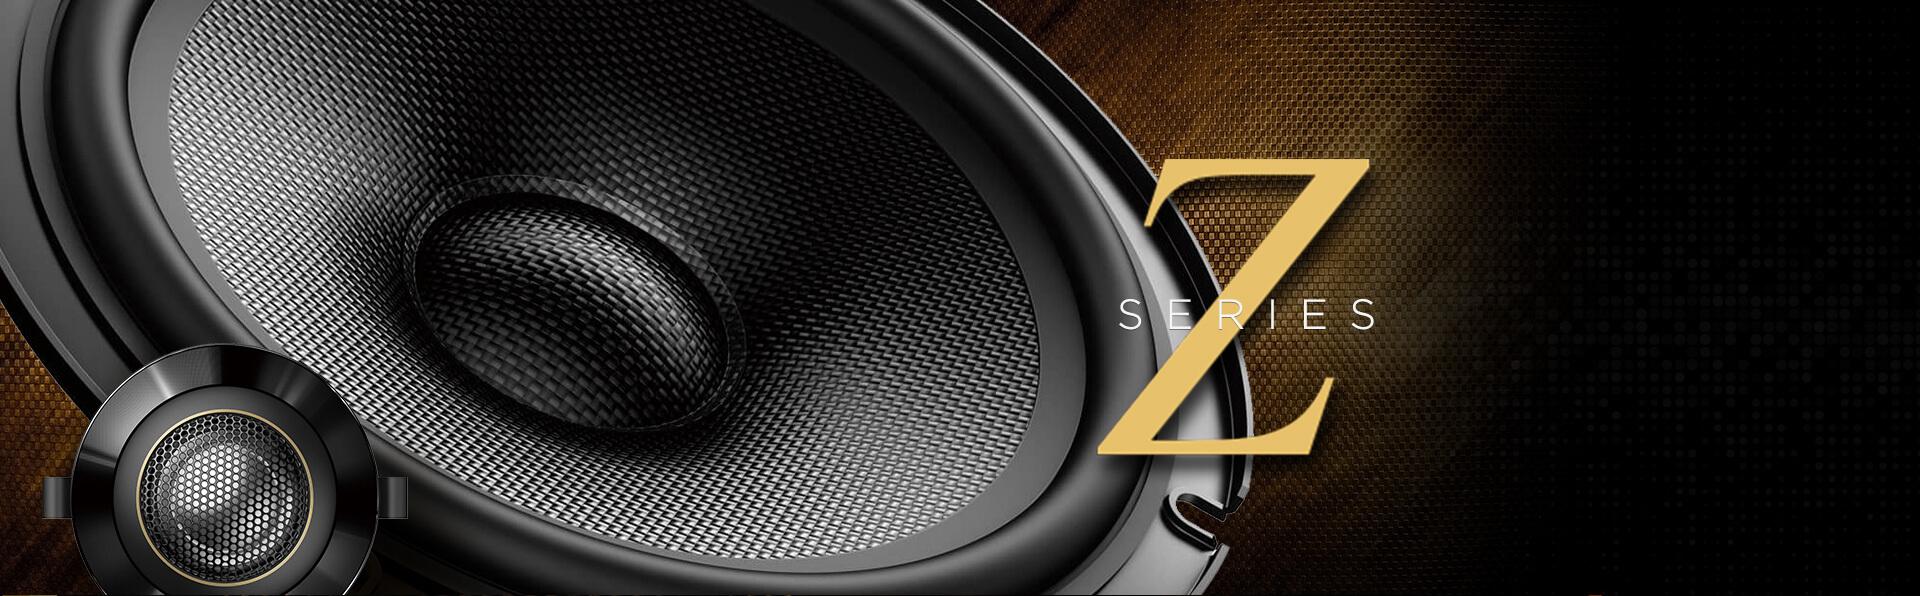 Z - Series